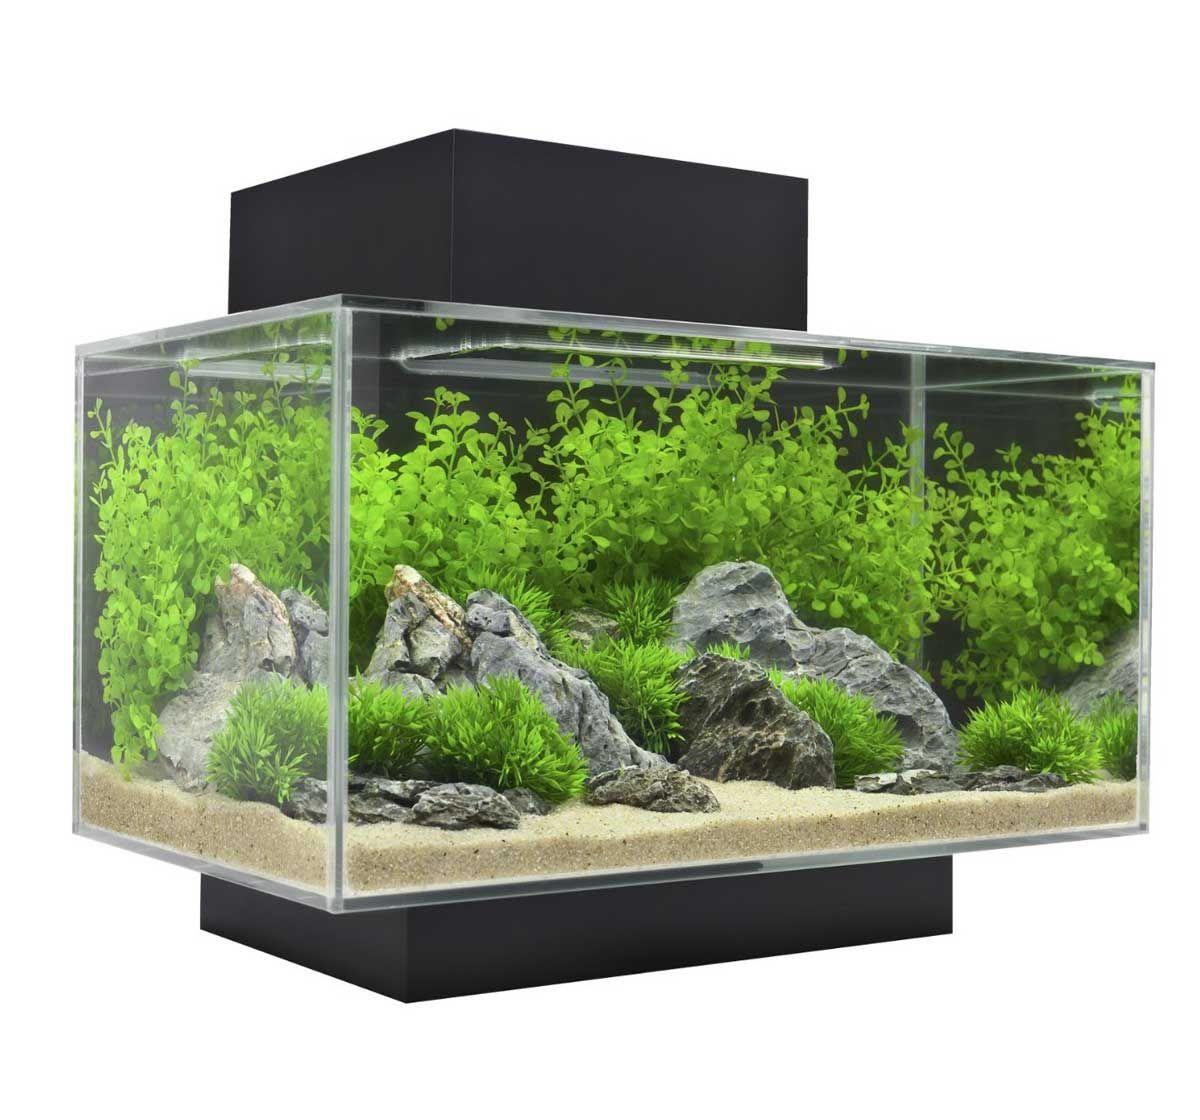 Fishspot In Fish Tank Plants Aquarium Set Aquarium Fish Tank